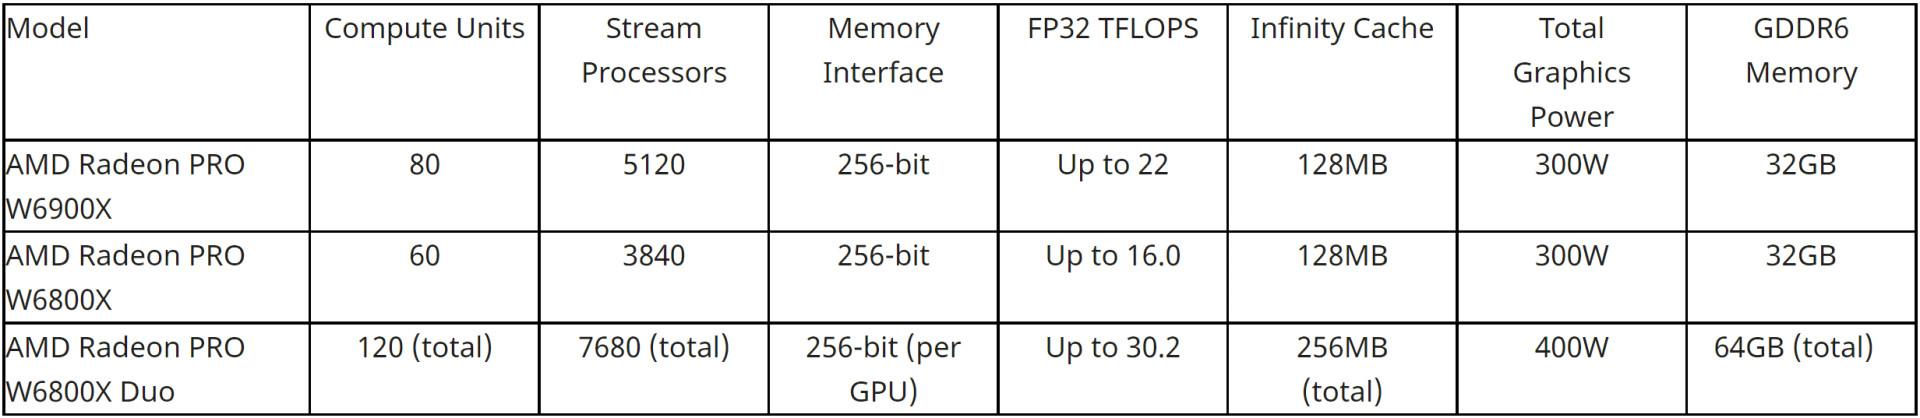 Radeon pro w6000x series specs